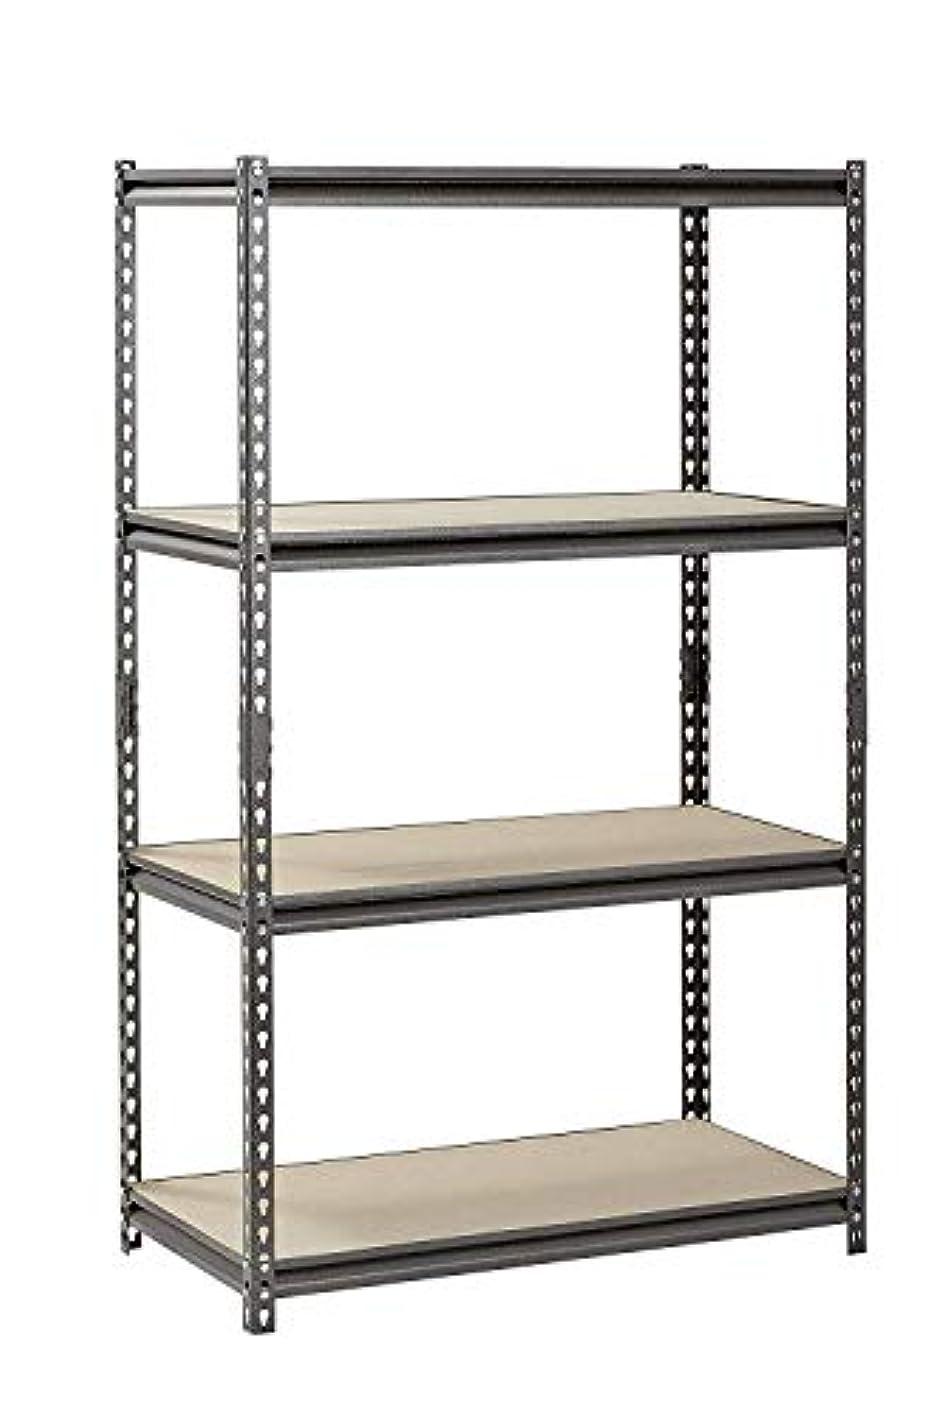 Silver Vein Steel Storage Rack, 4 Adjustable Shelves, 3200 lb. Capacity, 60